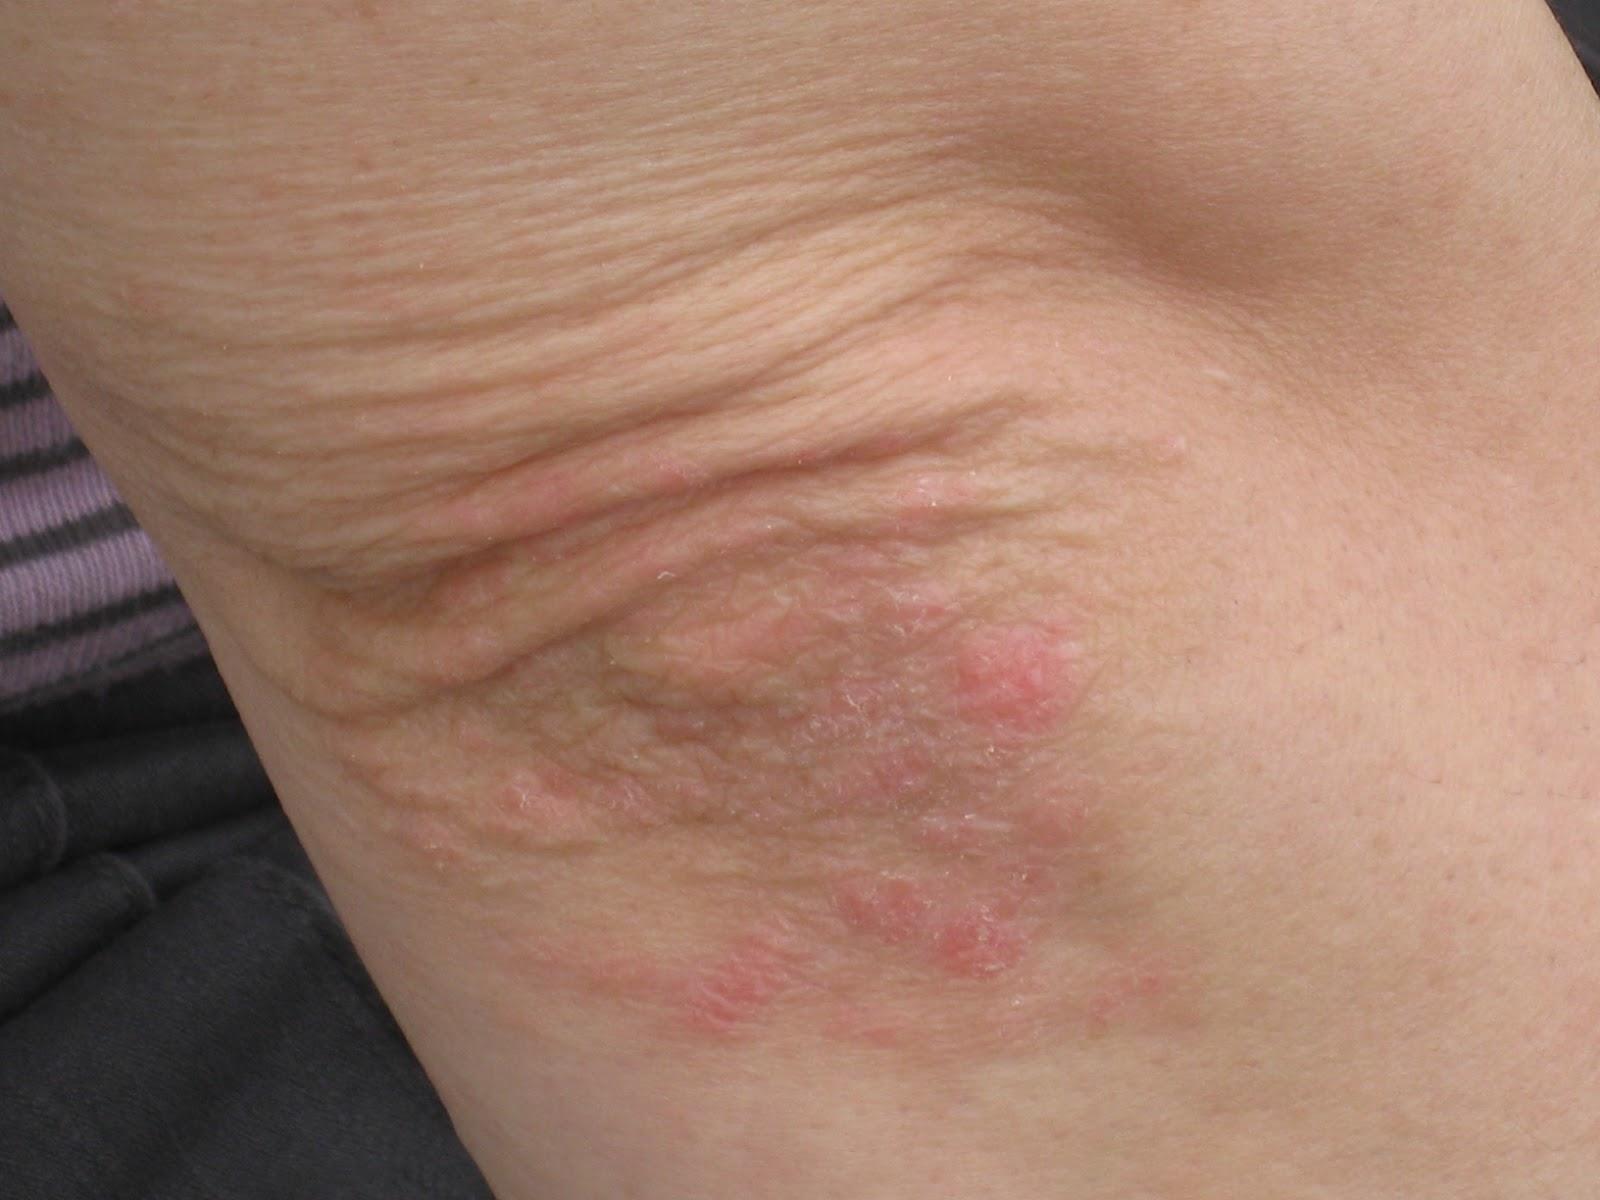 Sur le principal atopitchesky la dermatite de vidéo